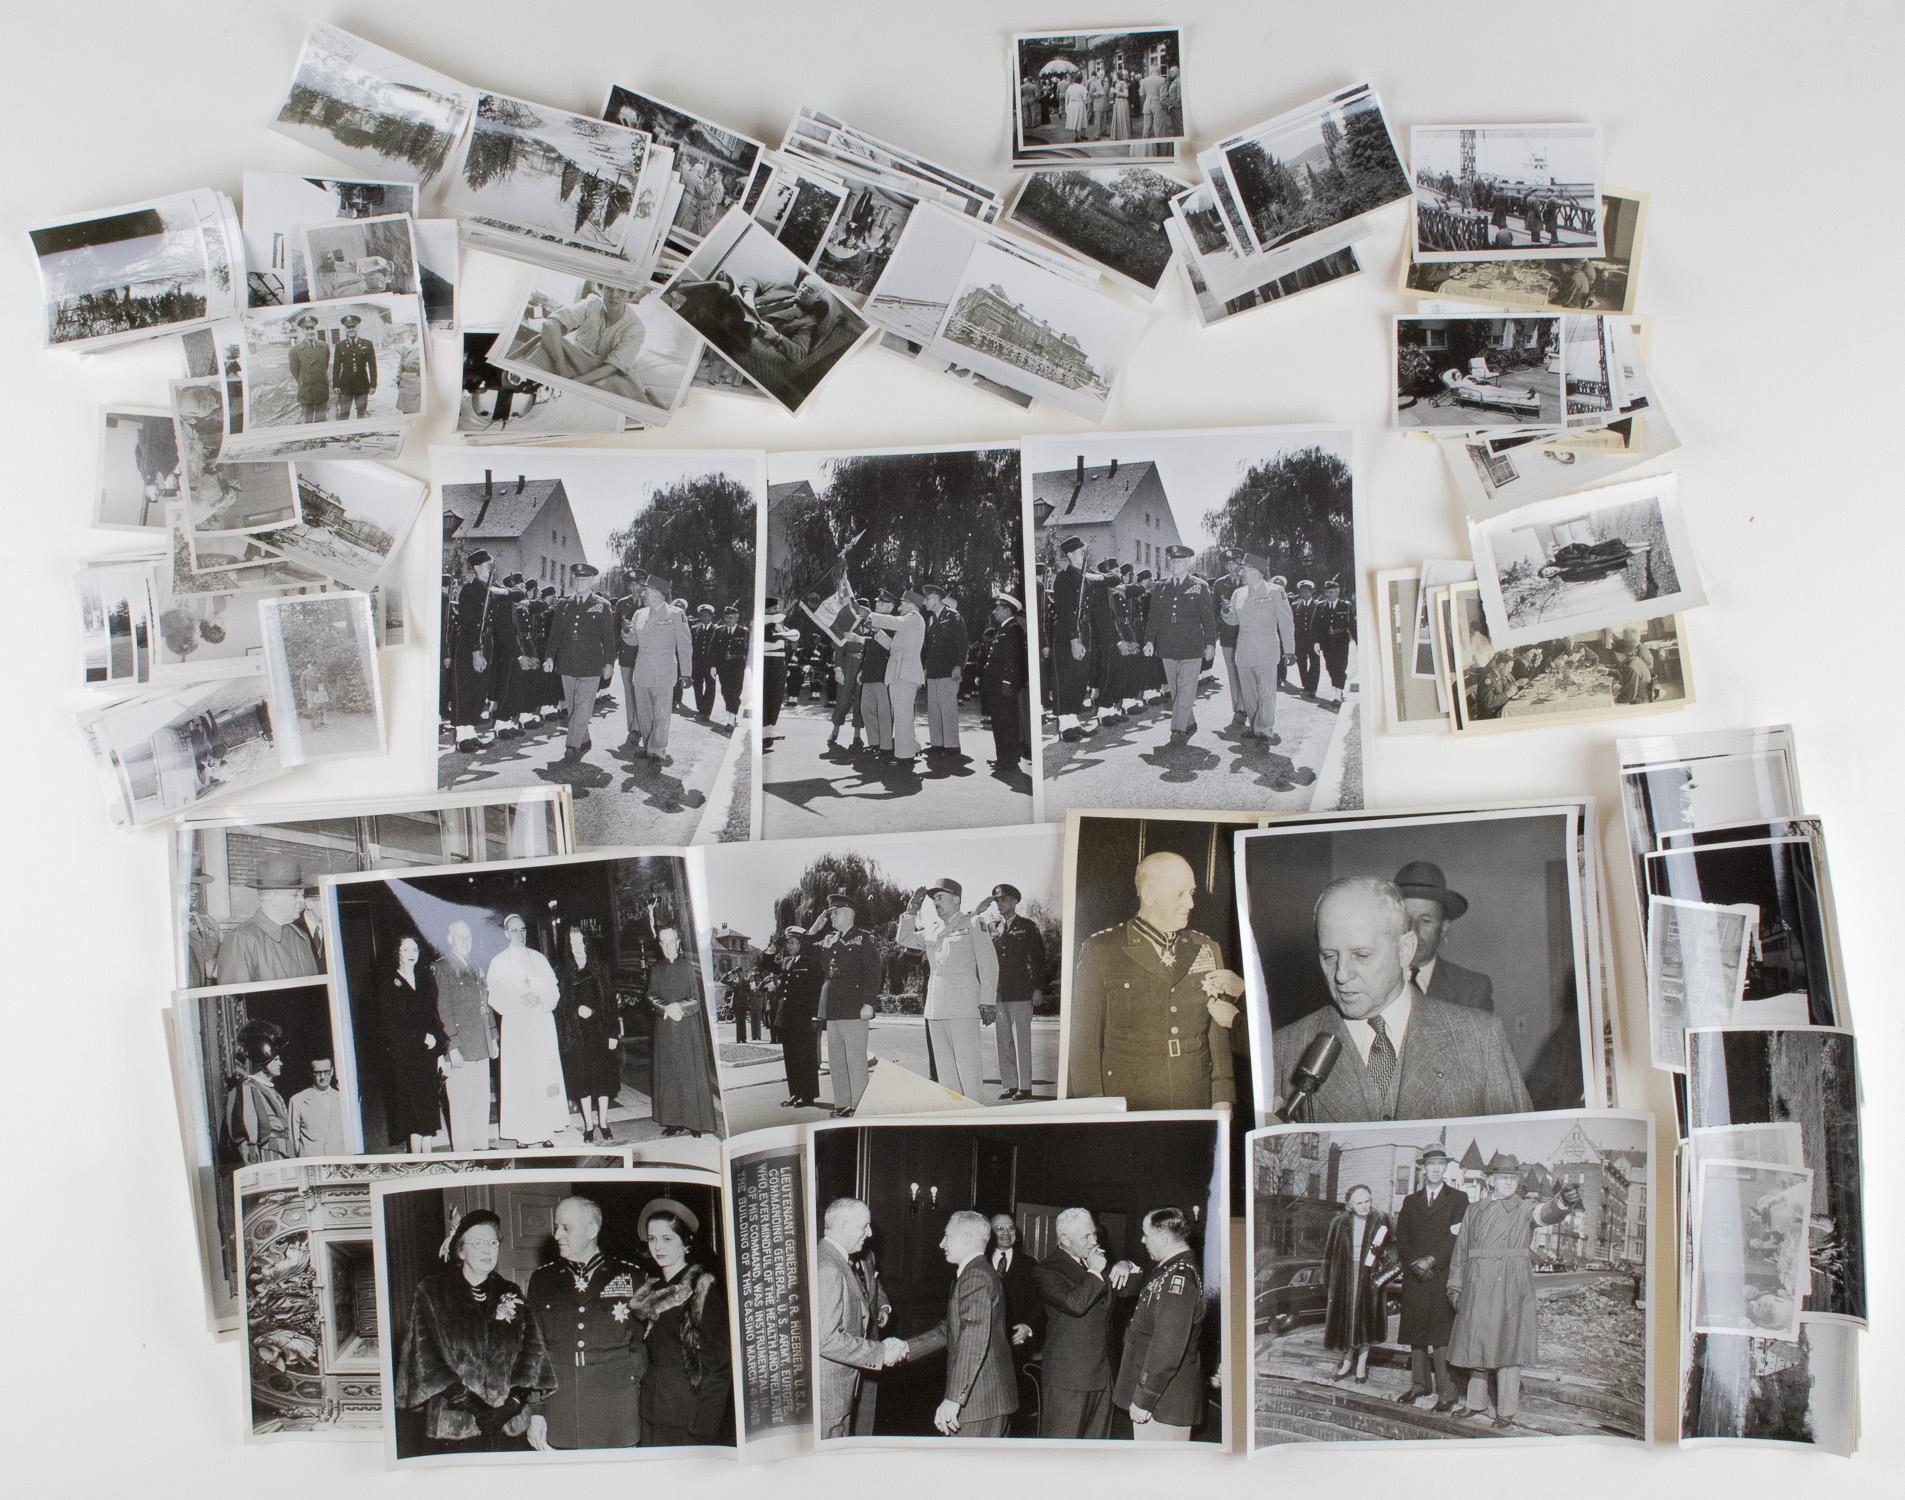 GEN. CLARENCE R. HUEBNER'S POSTWAR PHOTOGRAPHS (200+)